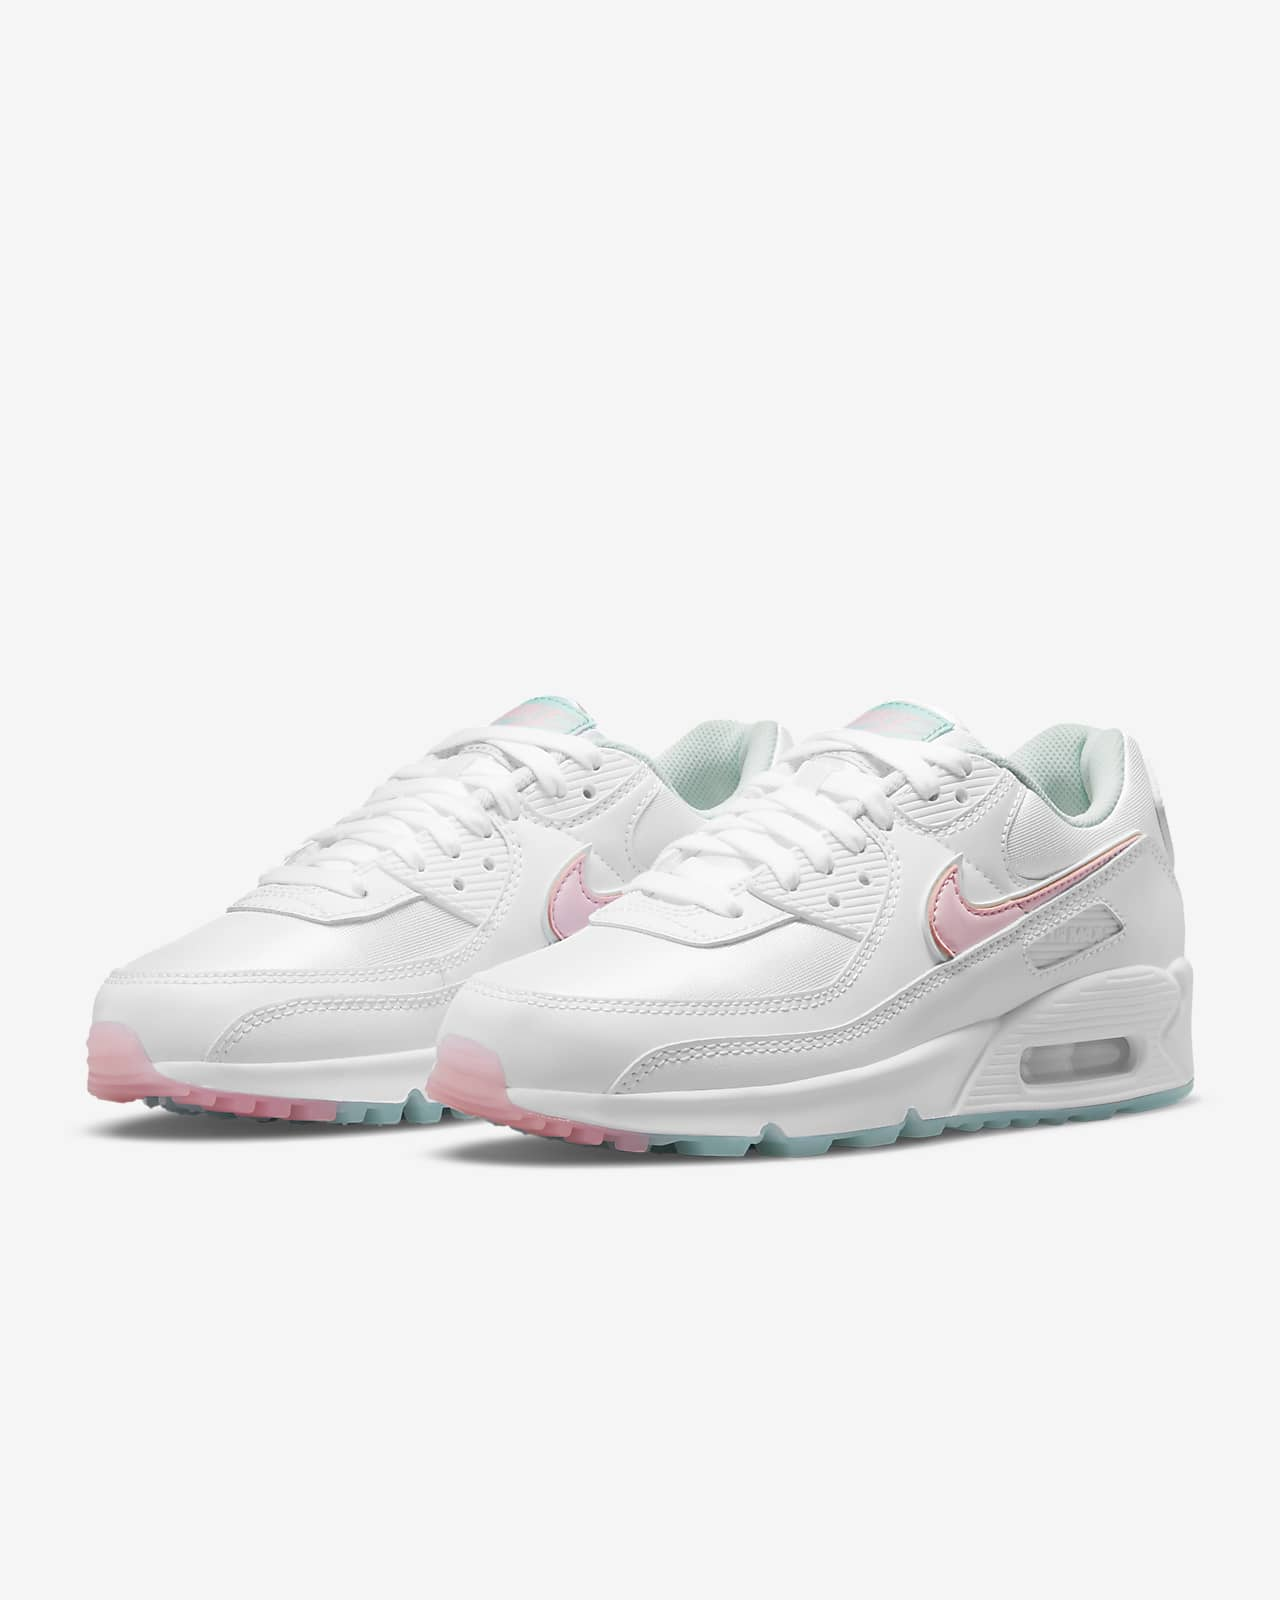 Nike Air Max 90 Women's Shoes. Nike PH